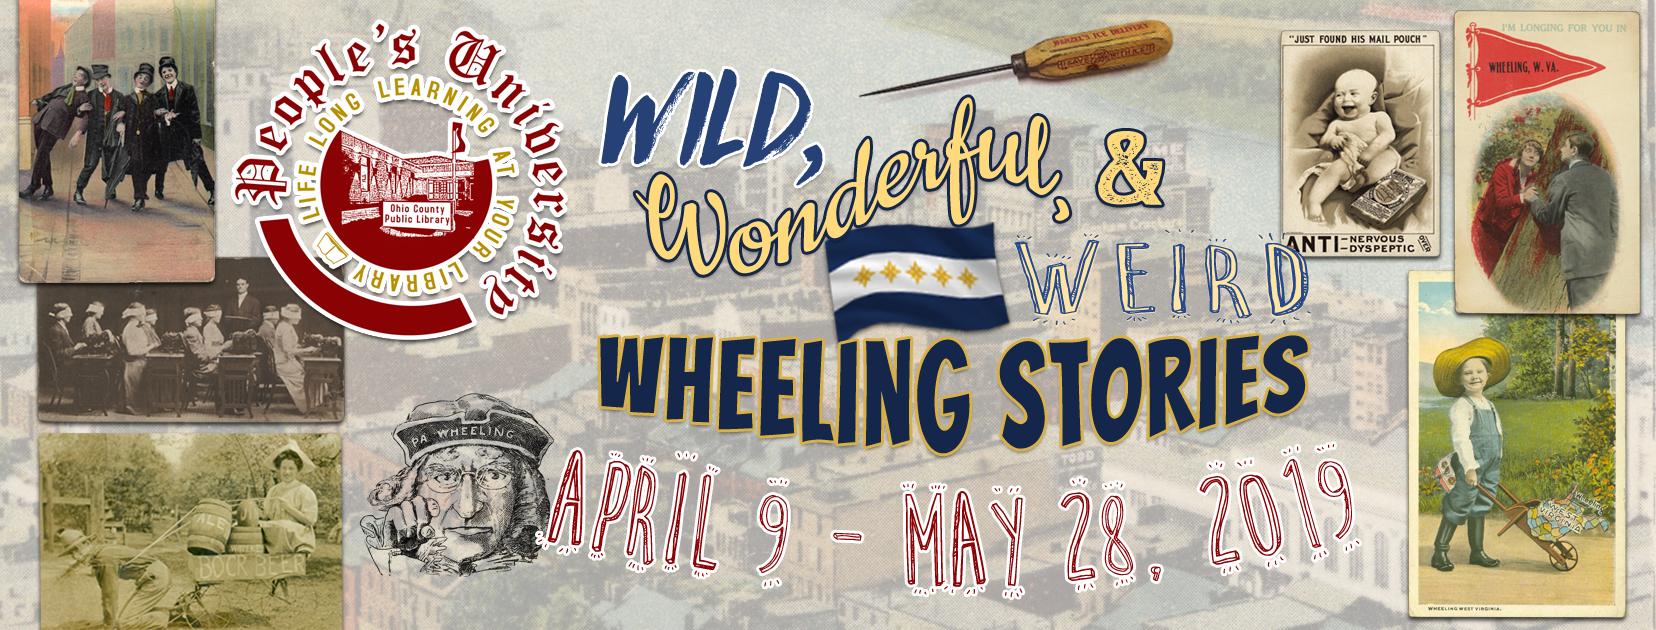 People's U: Wild, Wonderful, Wild Wheeling Stories